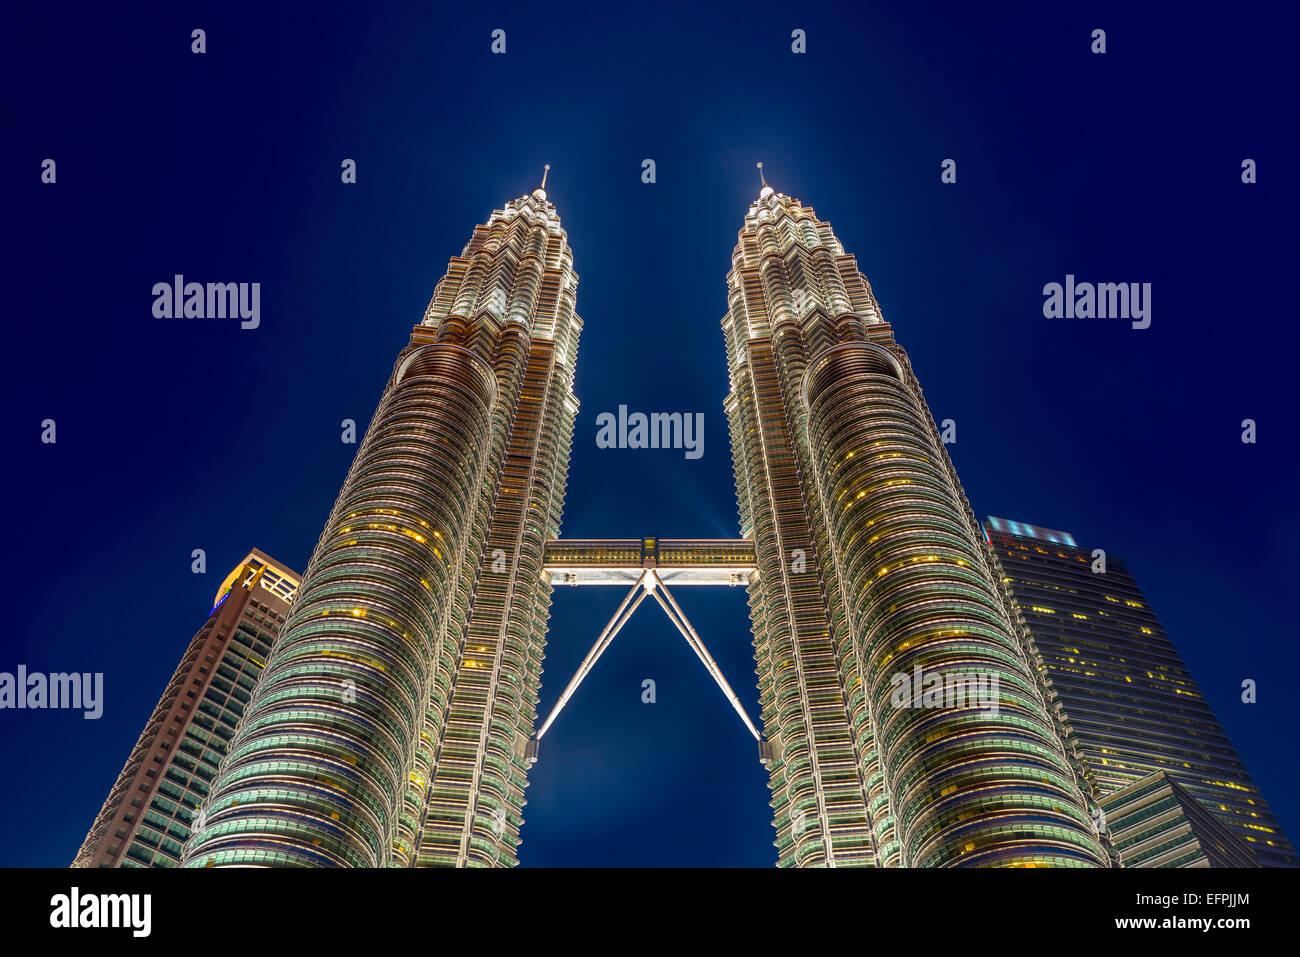 Torres Petronas, Kuala Lumpur, Malasia, Sudeste Asiático, Asia Imagen De Stock